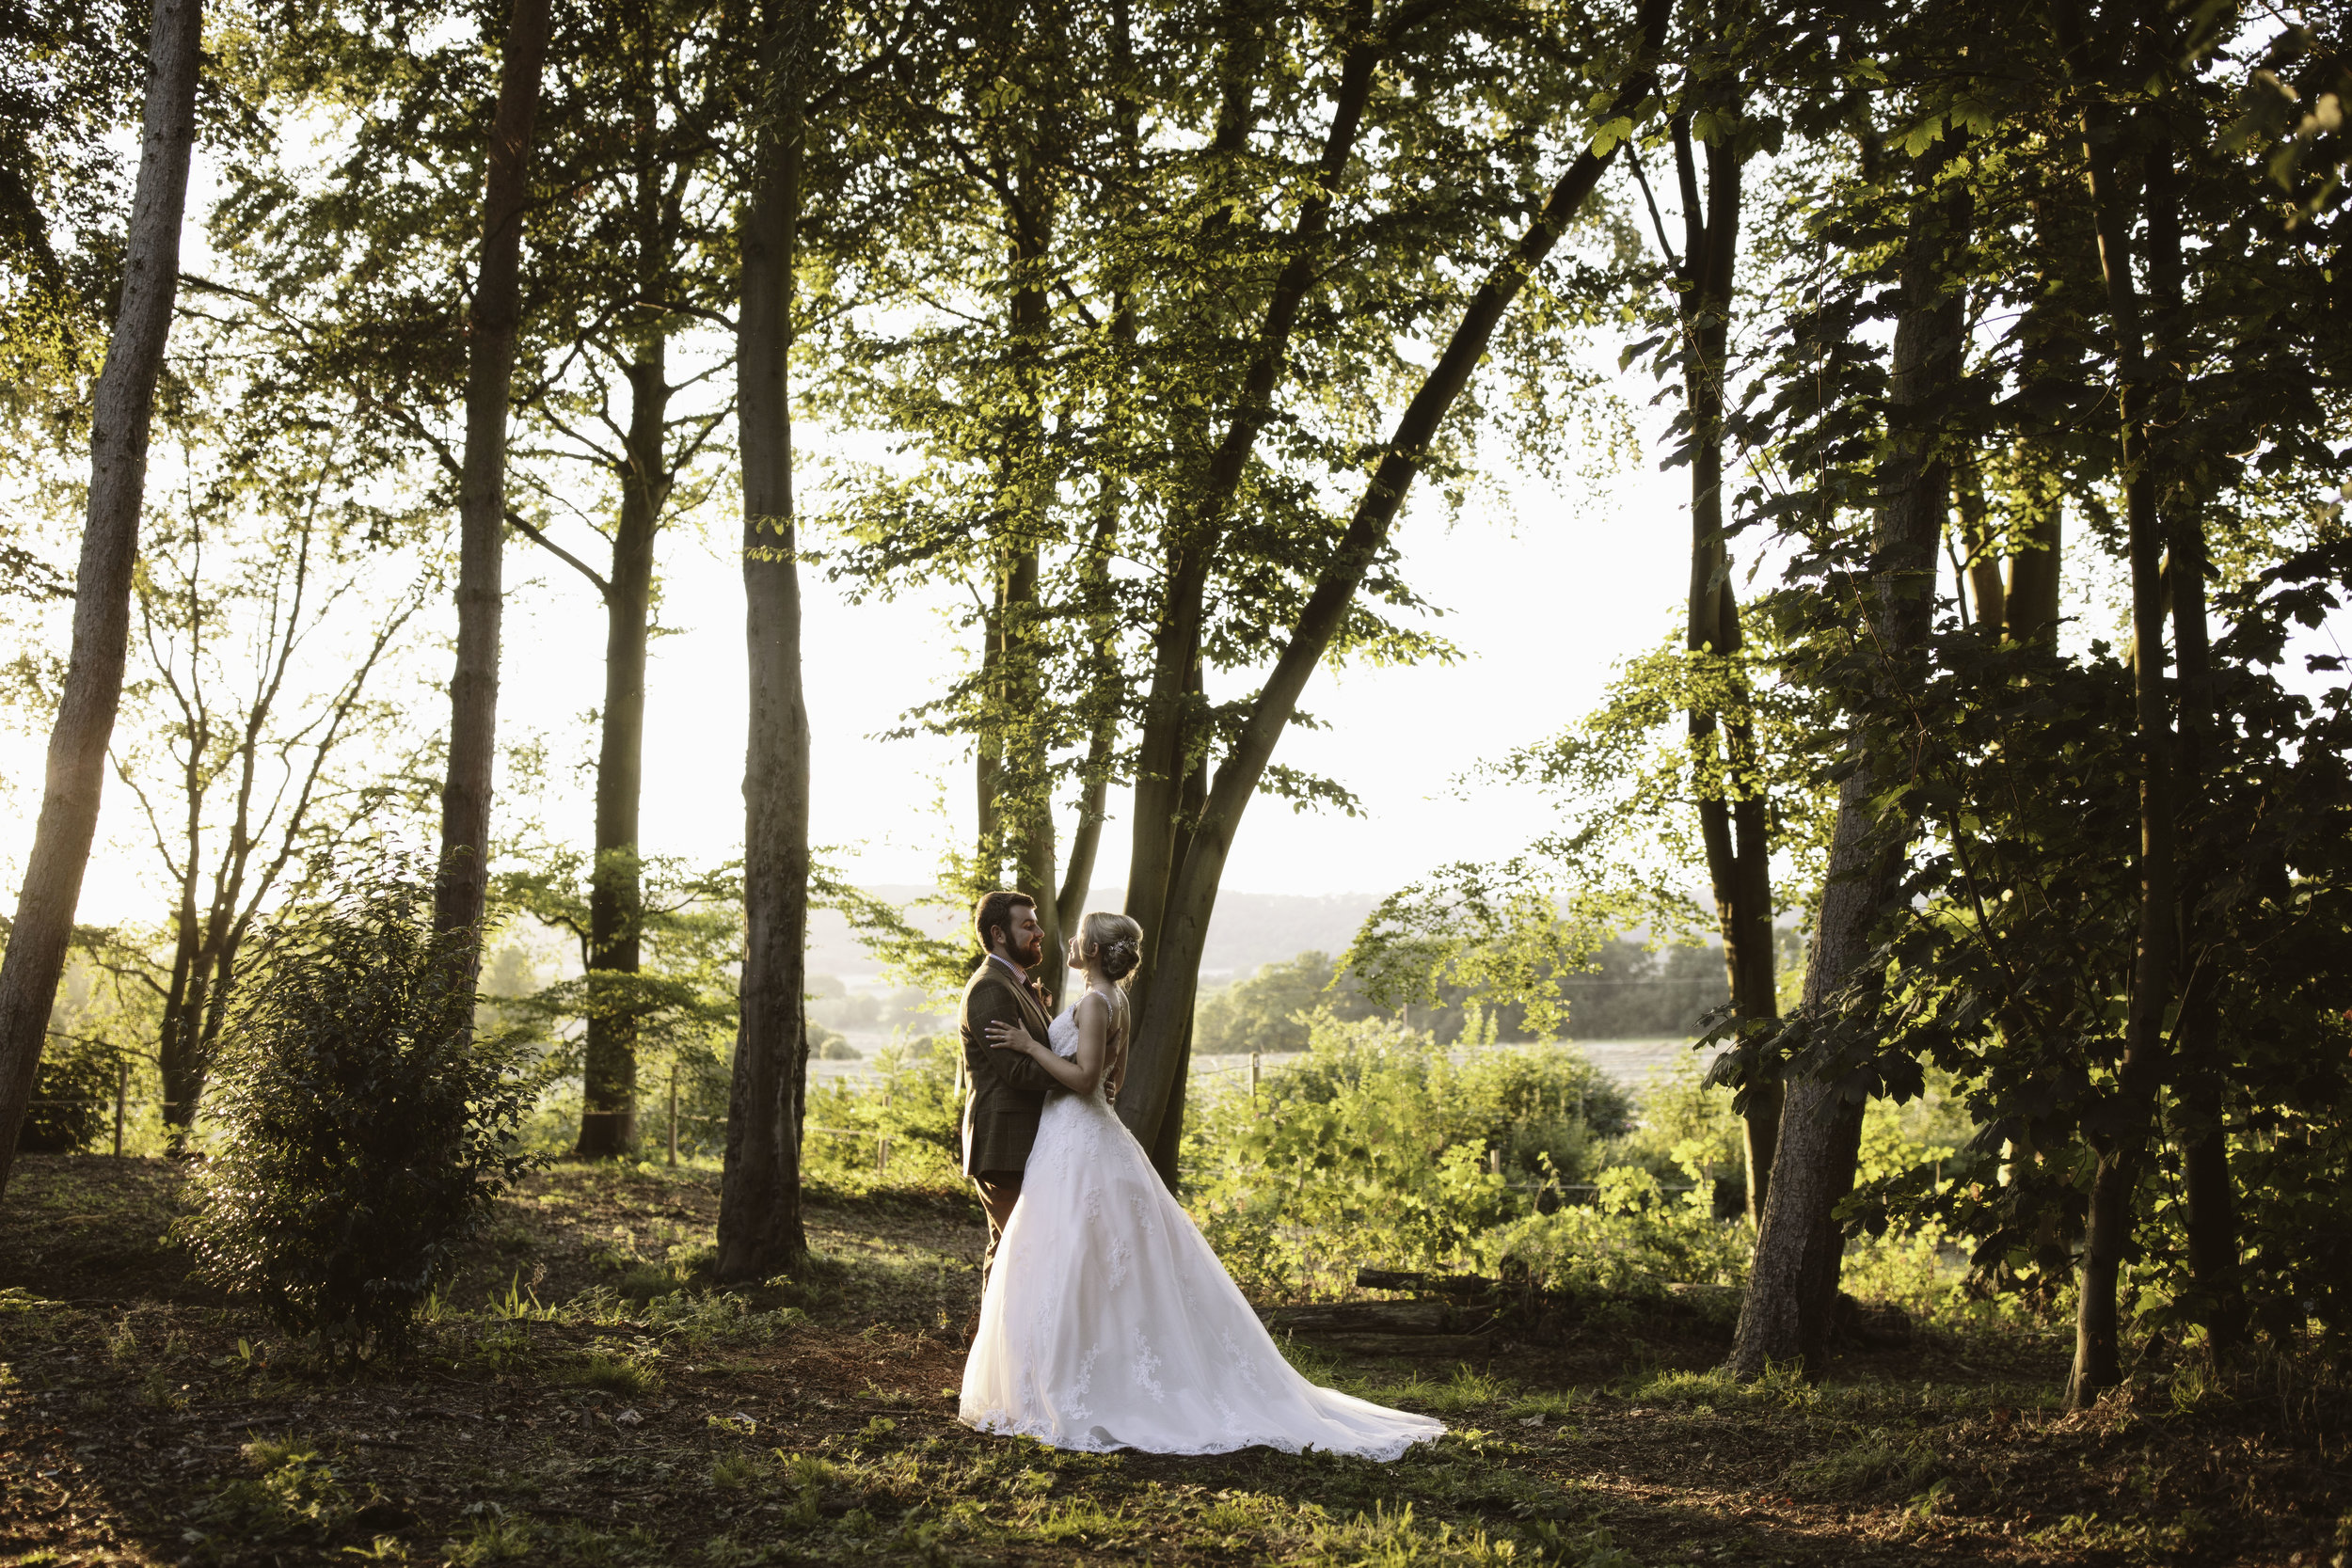 kent wedding photography maidstone james davies.jpg